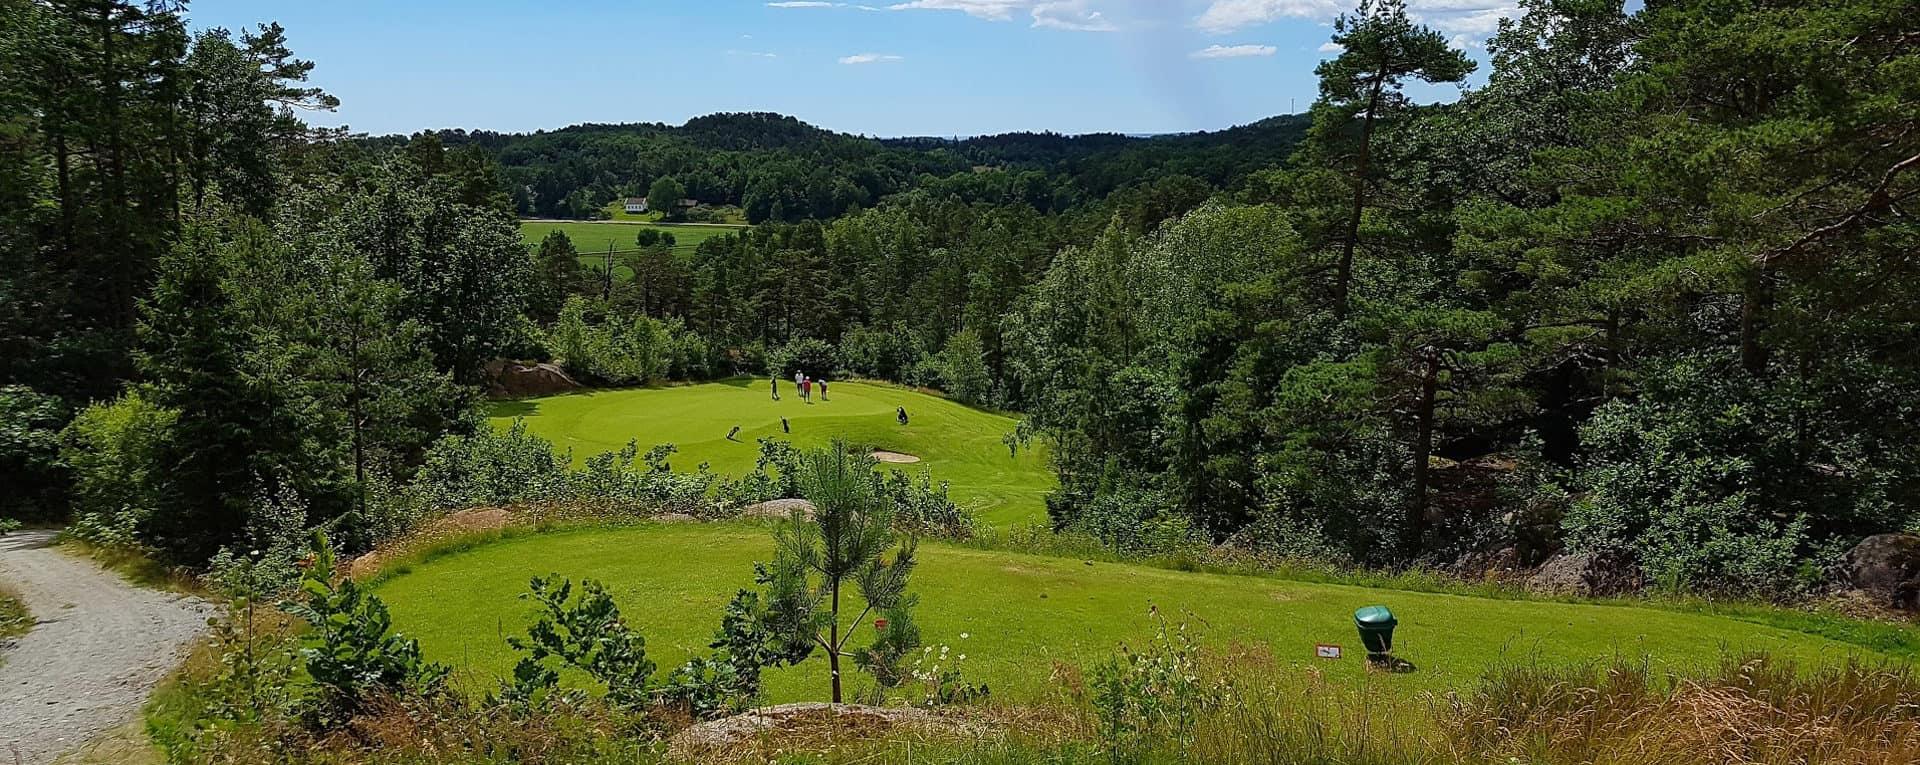 Grimstad Golfklubb